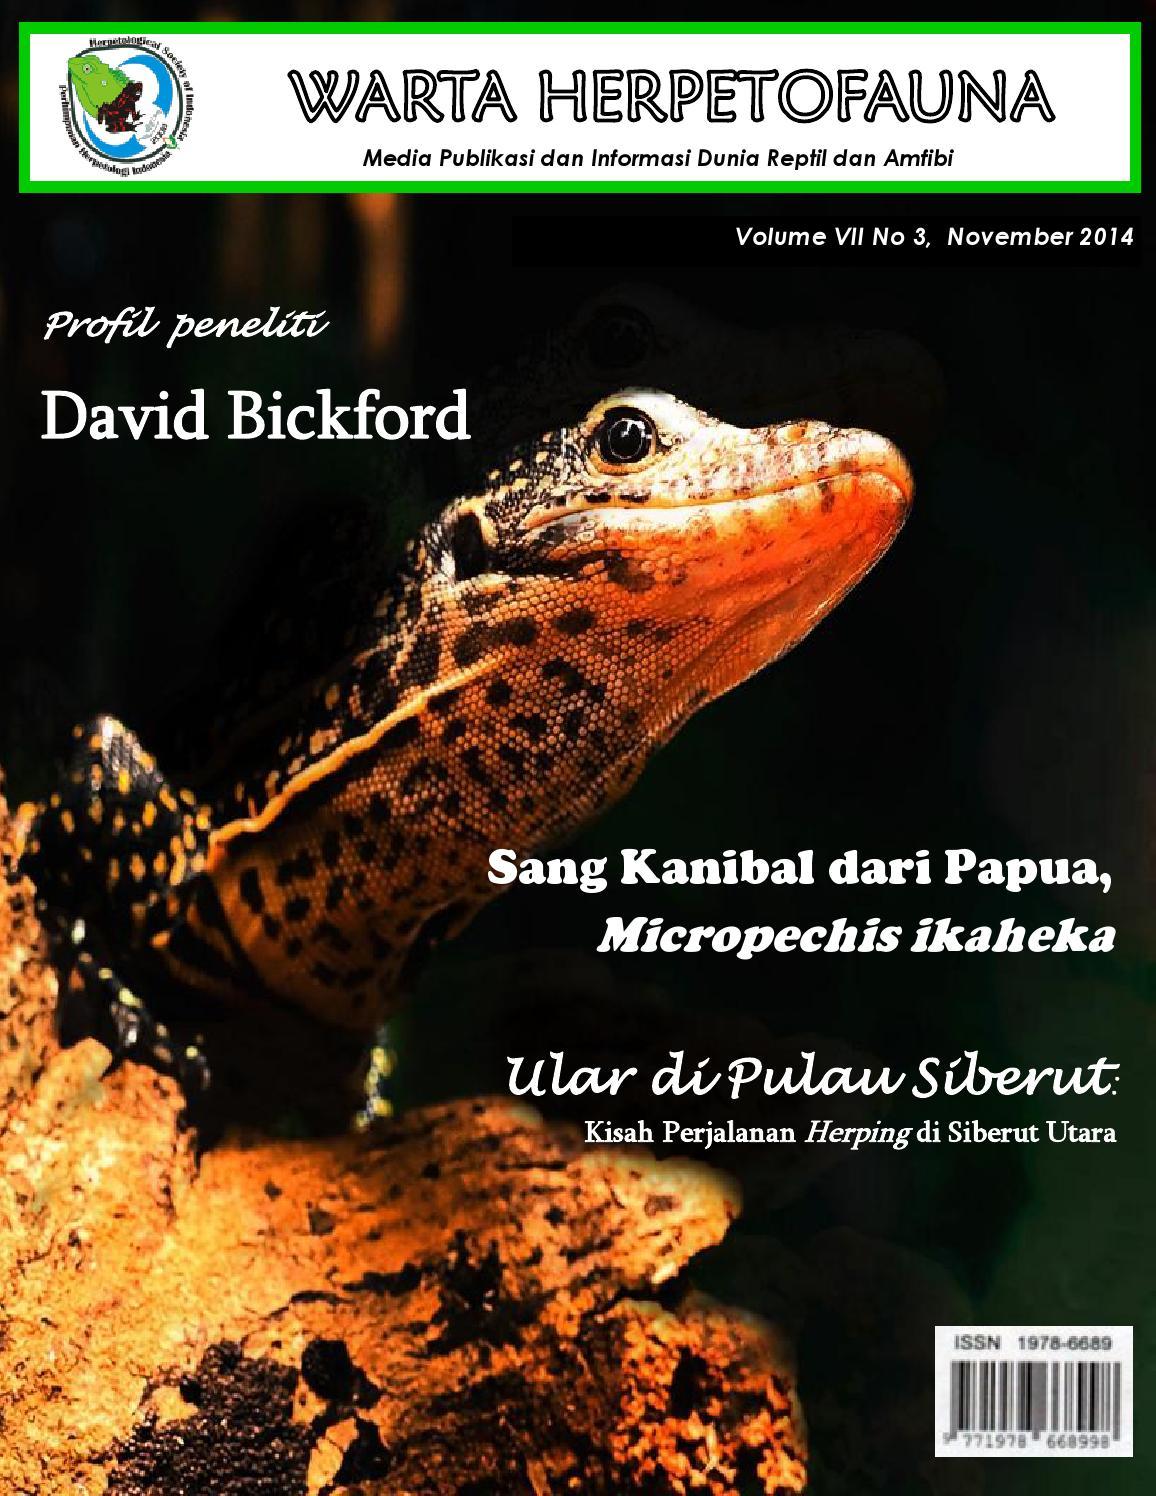 Warta Herpetofauna Edisi November 2014 By Perhimpunan Herpetologi